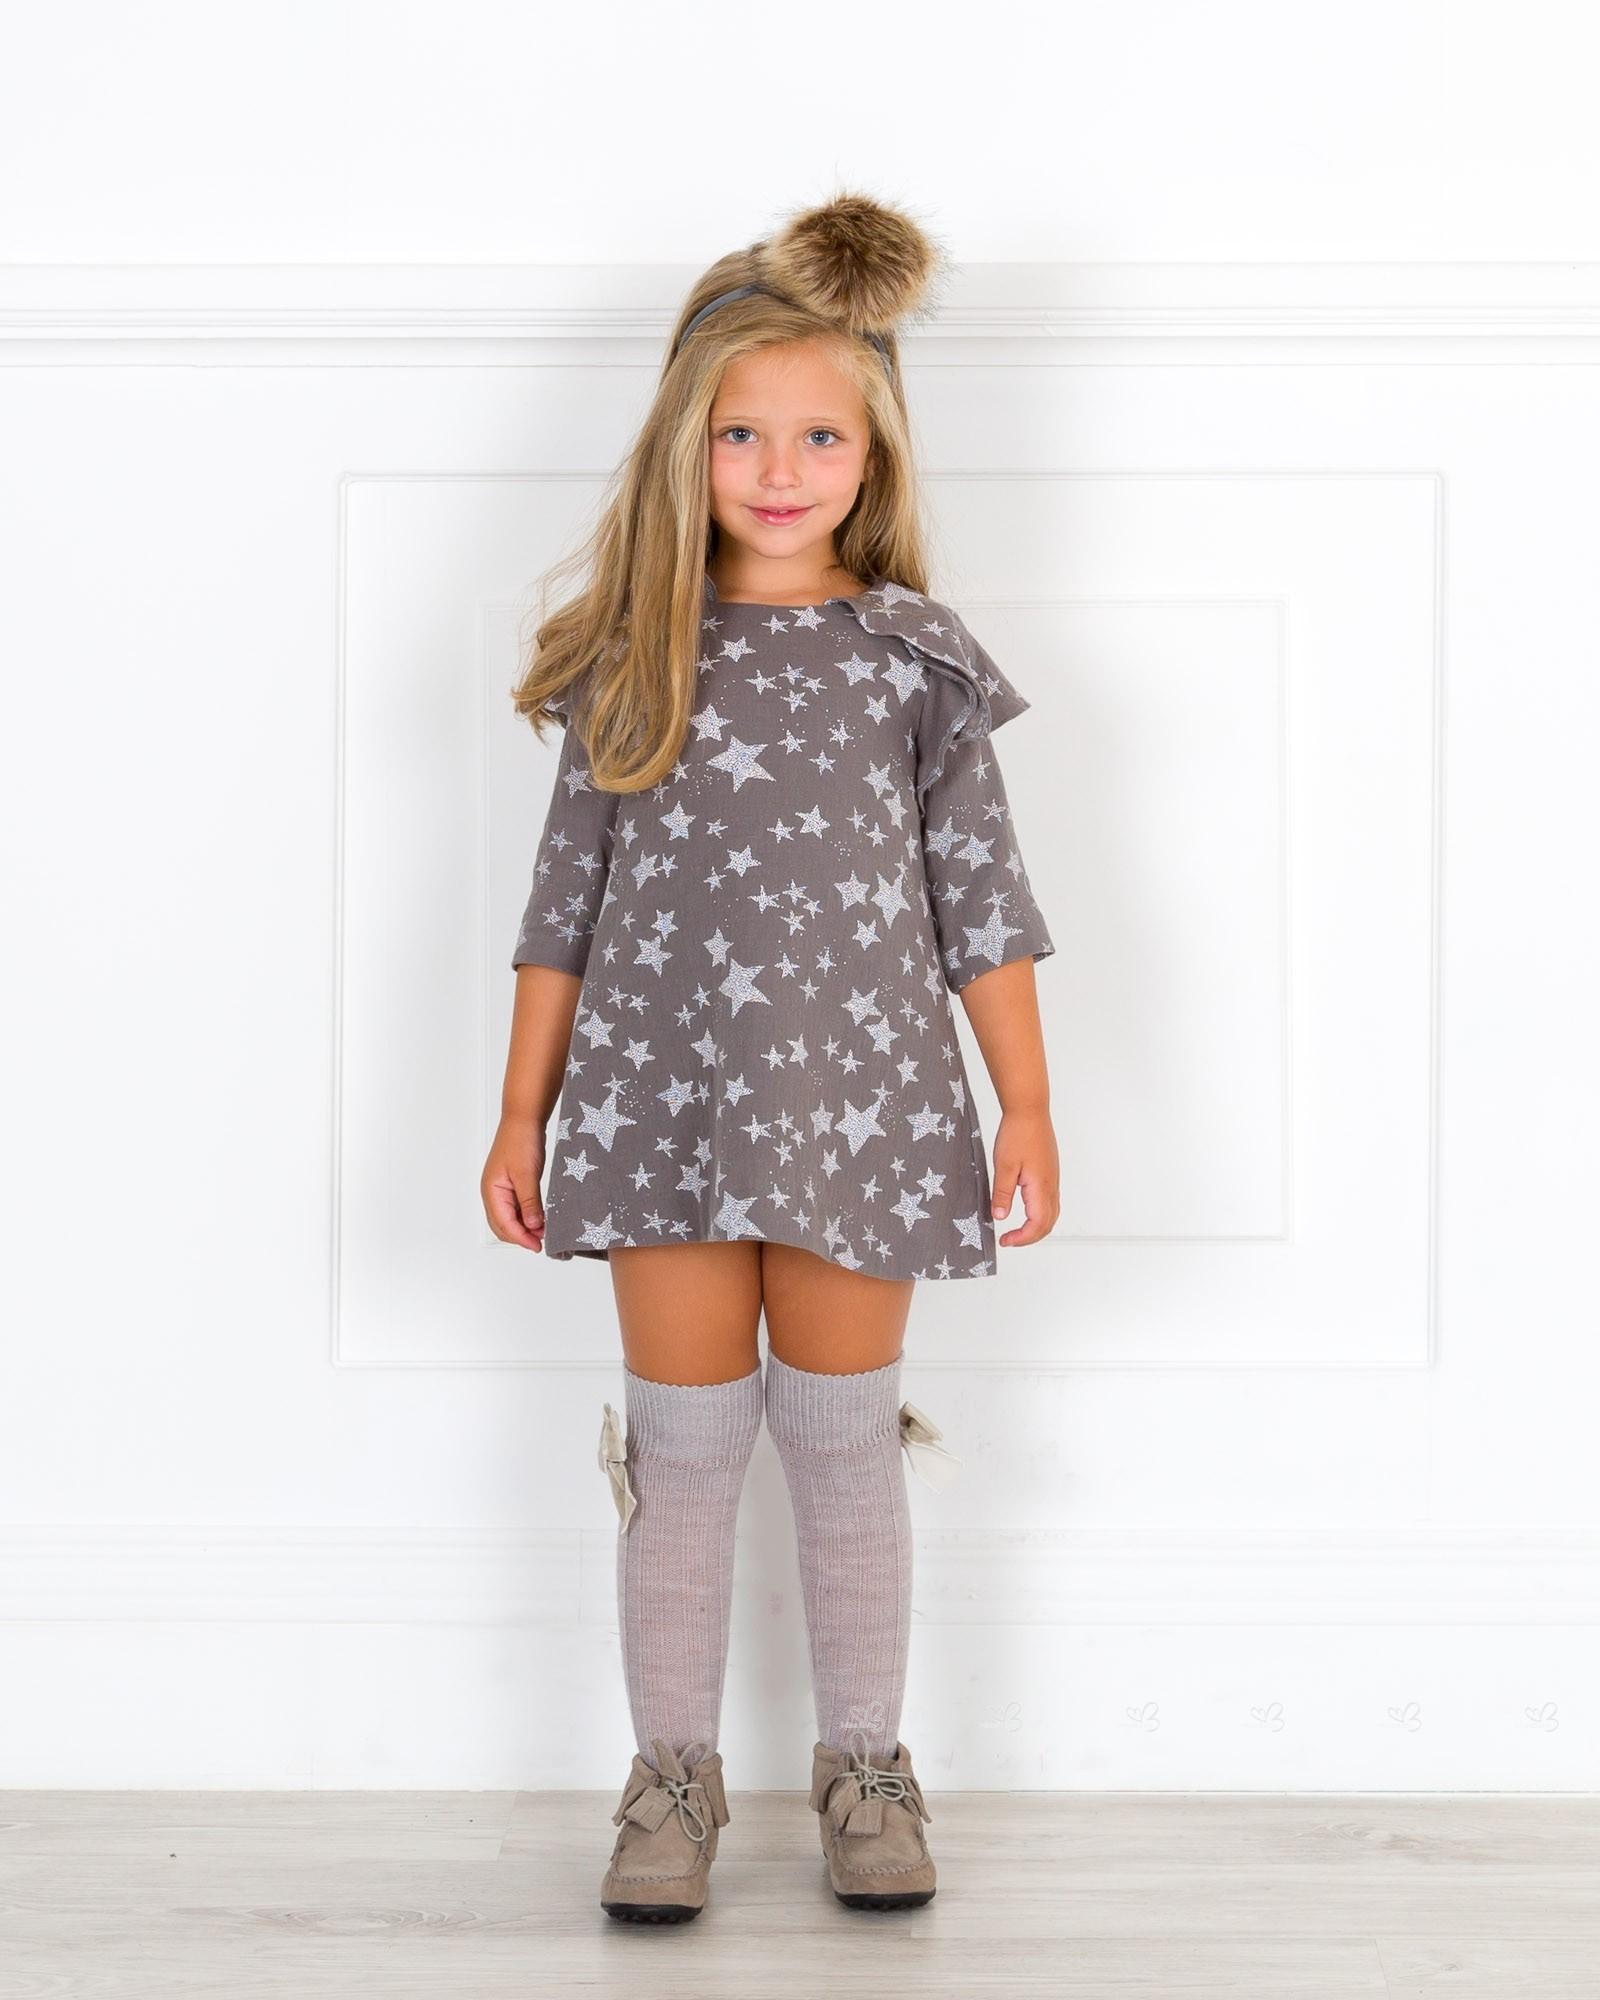 Girls Grey Star Dress Outfit Missbaby